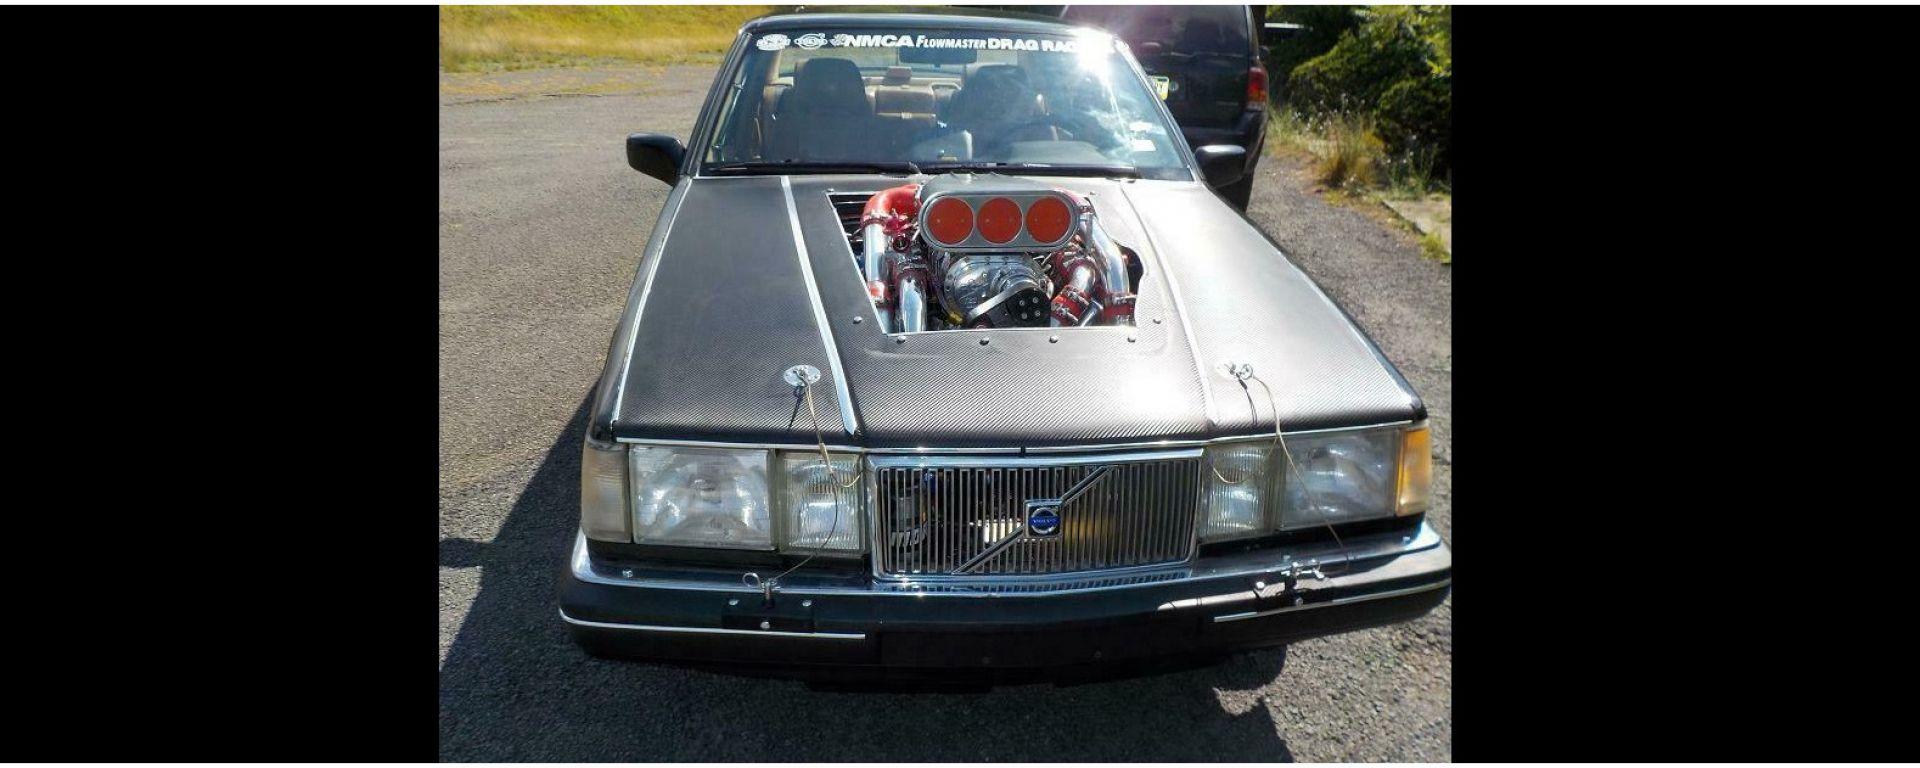 Volvo 960 Turbo Dart Racing: vista frontale